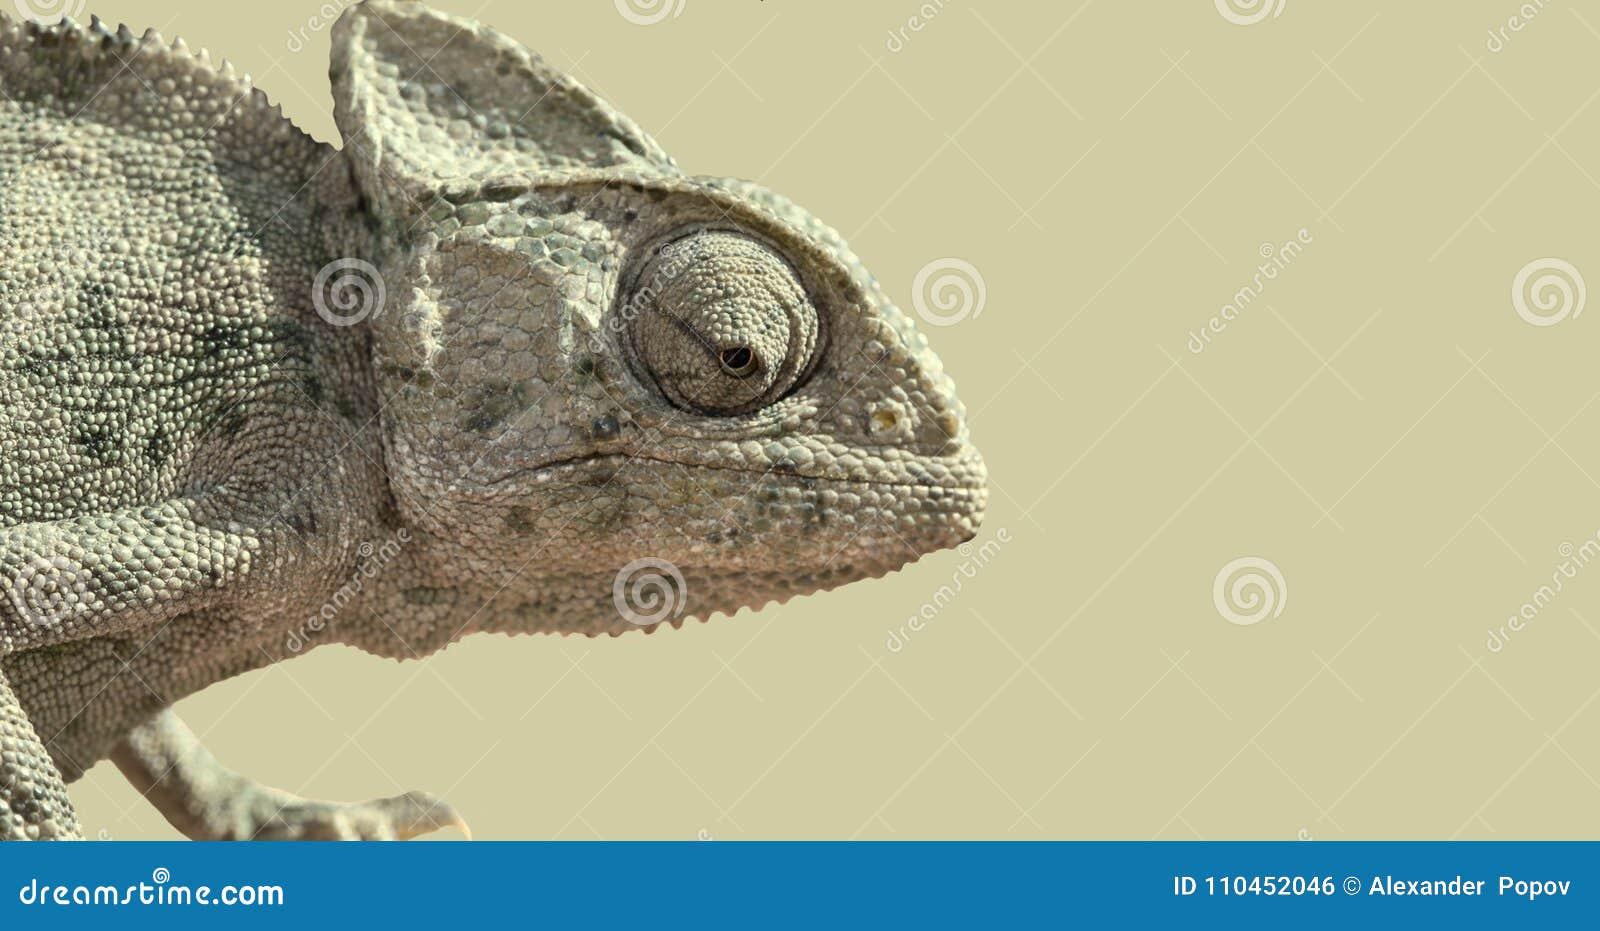 Kameleontstående i profil